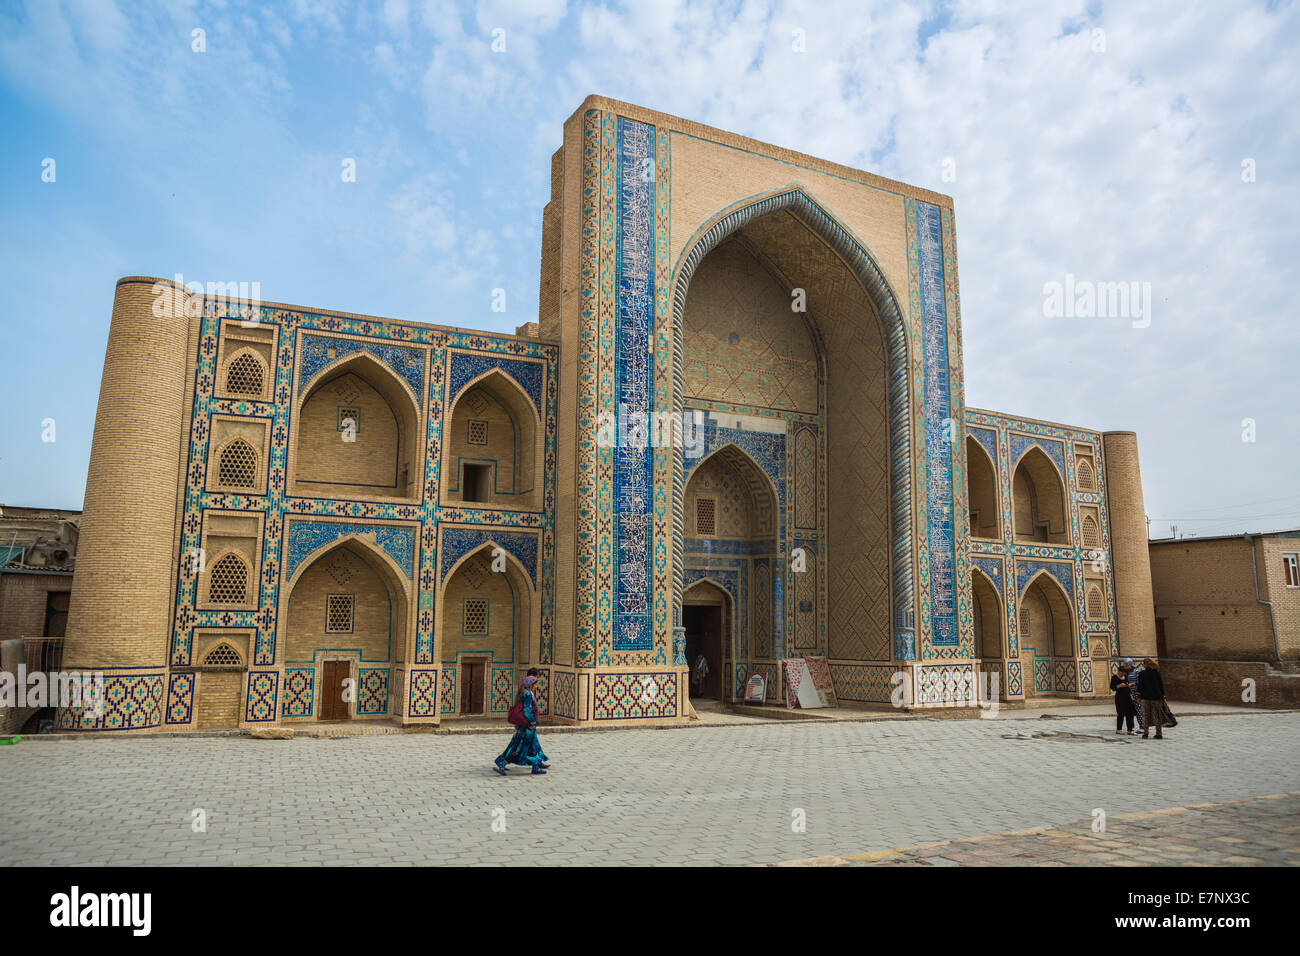 Abdul Aziz, Bukhara, Medressah, Uzbekistan, Central Asia, Asia, architecture, city, colourful, history, khan, medresa, - Stock Image